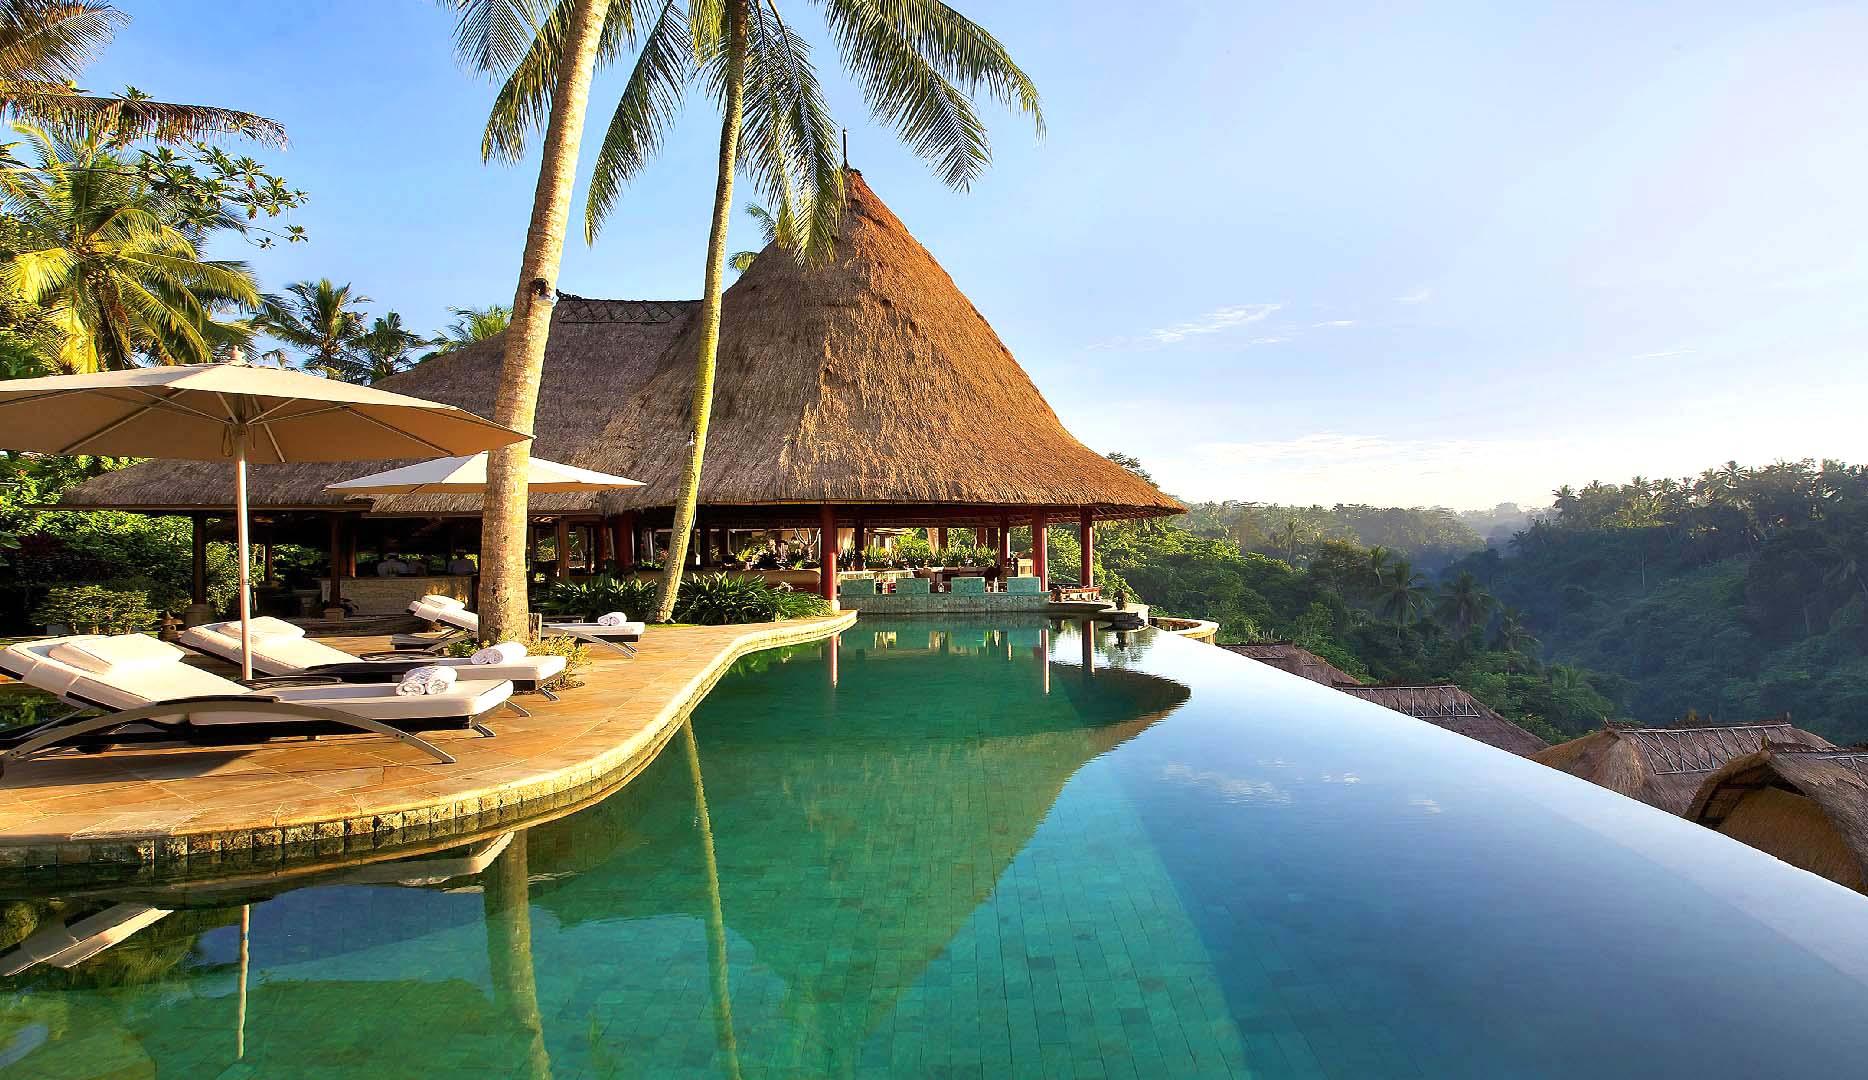 11.Bali, Indonesia